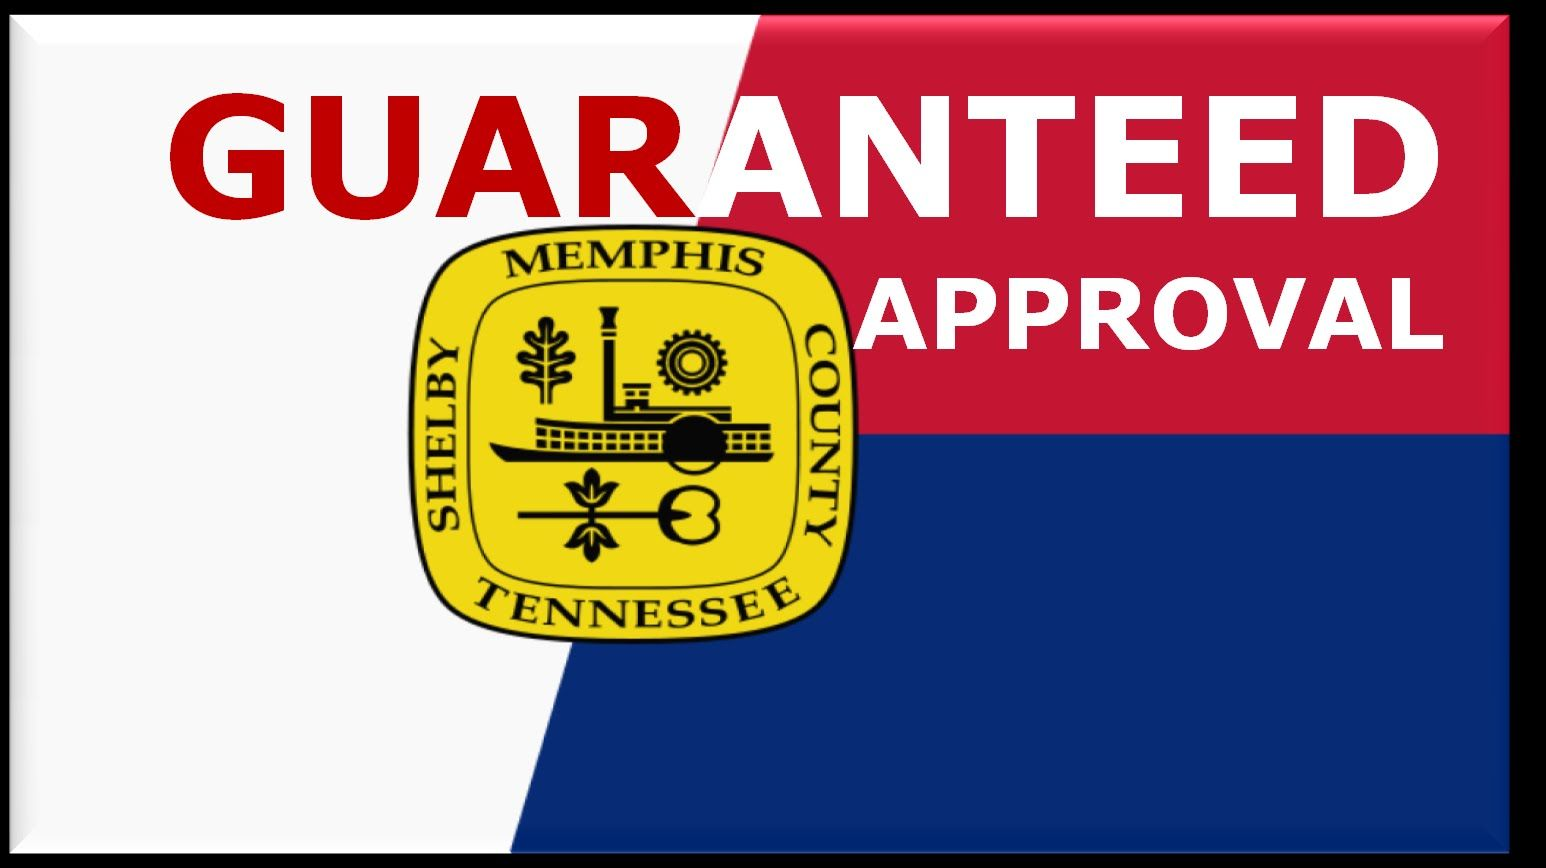 Memphis Tn Automobile Financing Bad Credit No Credit Car Loans